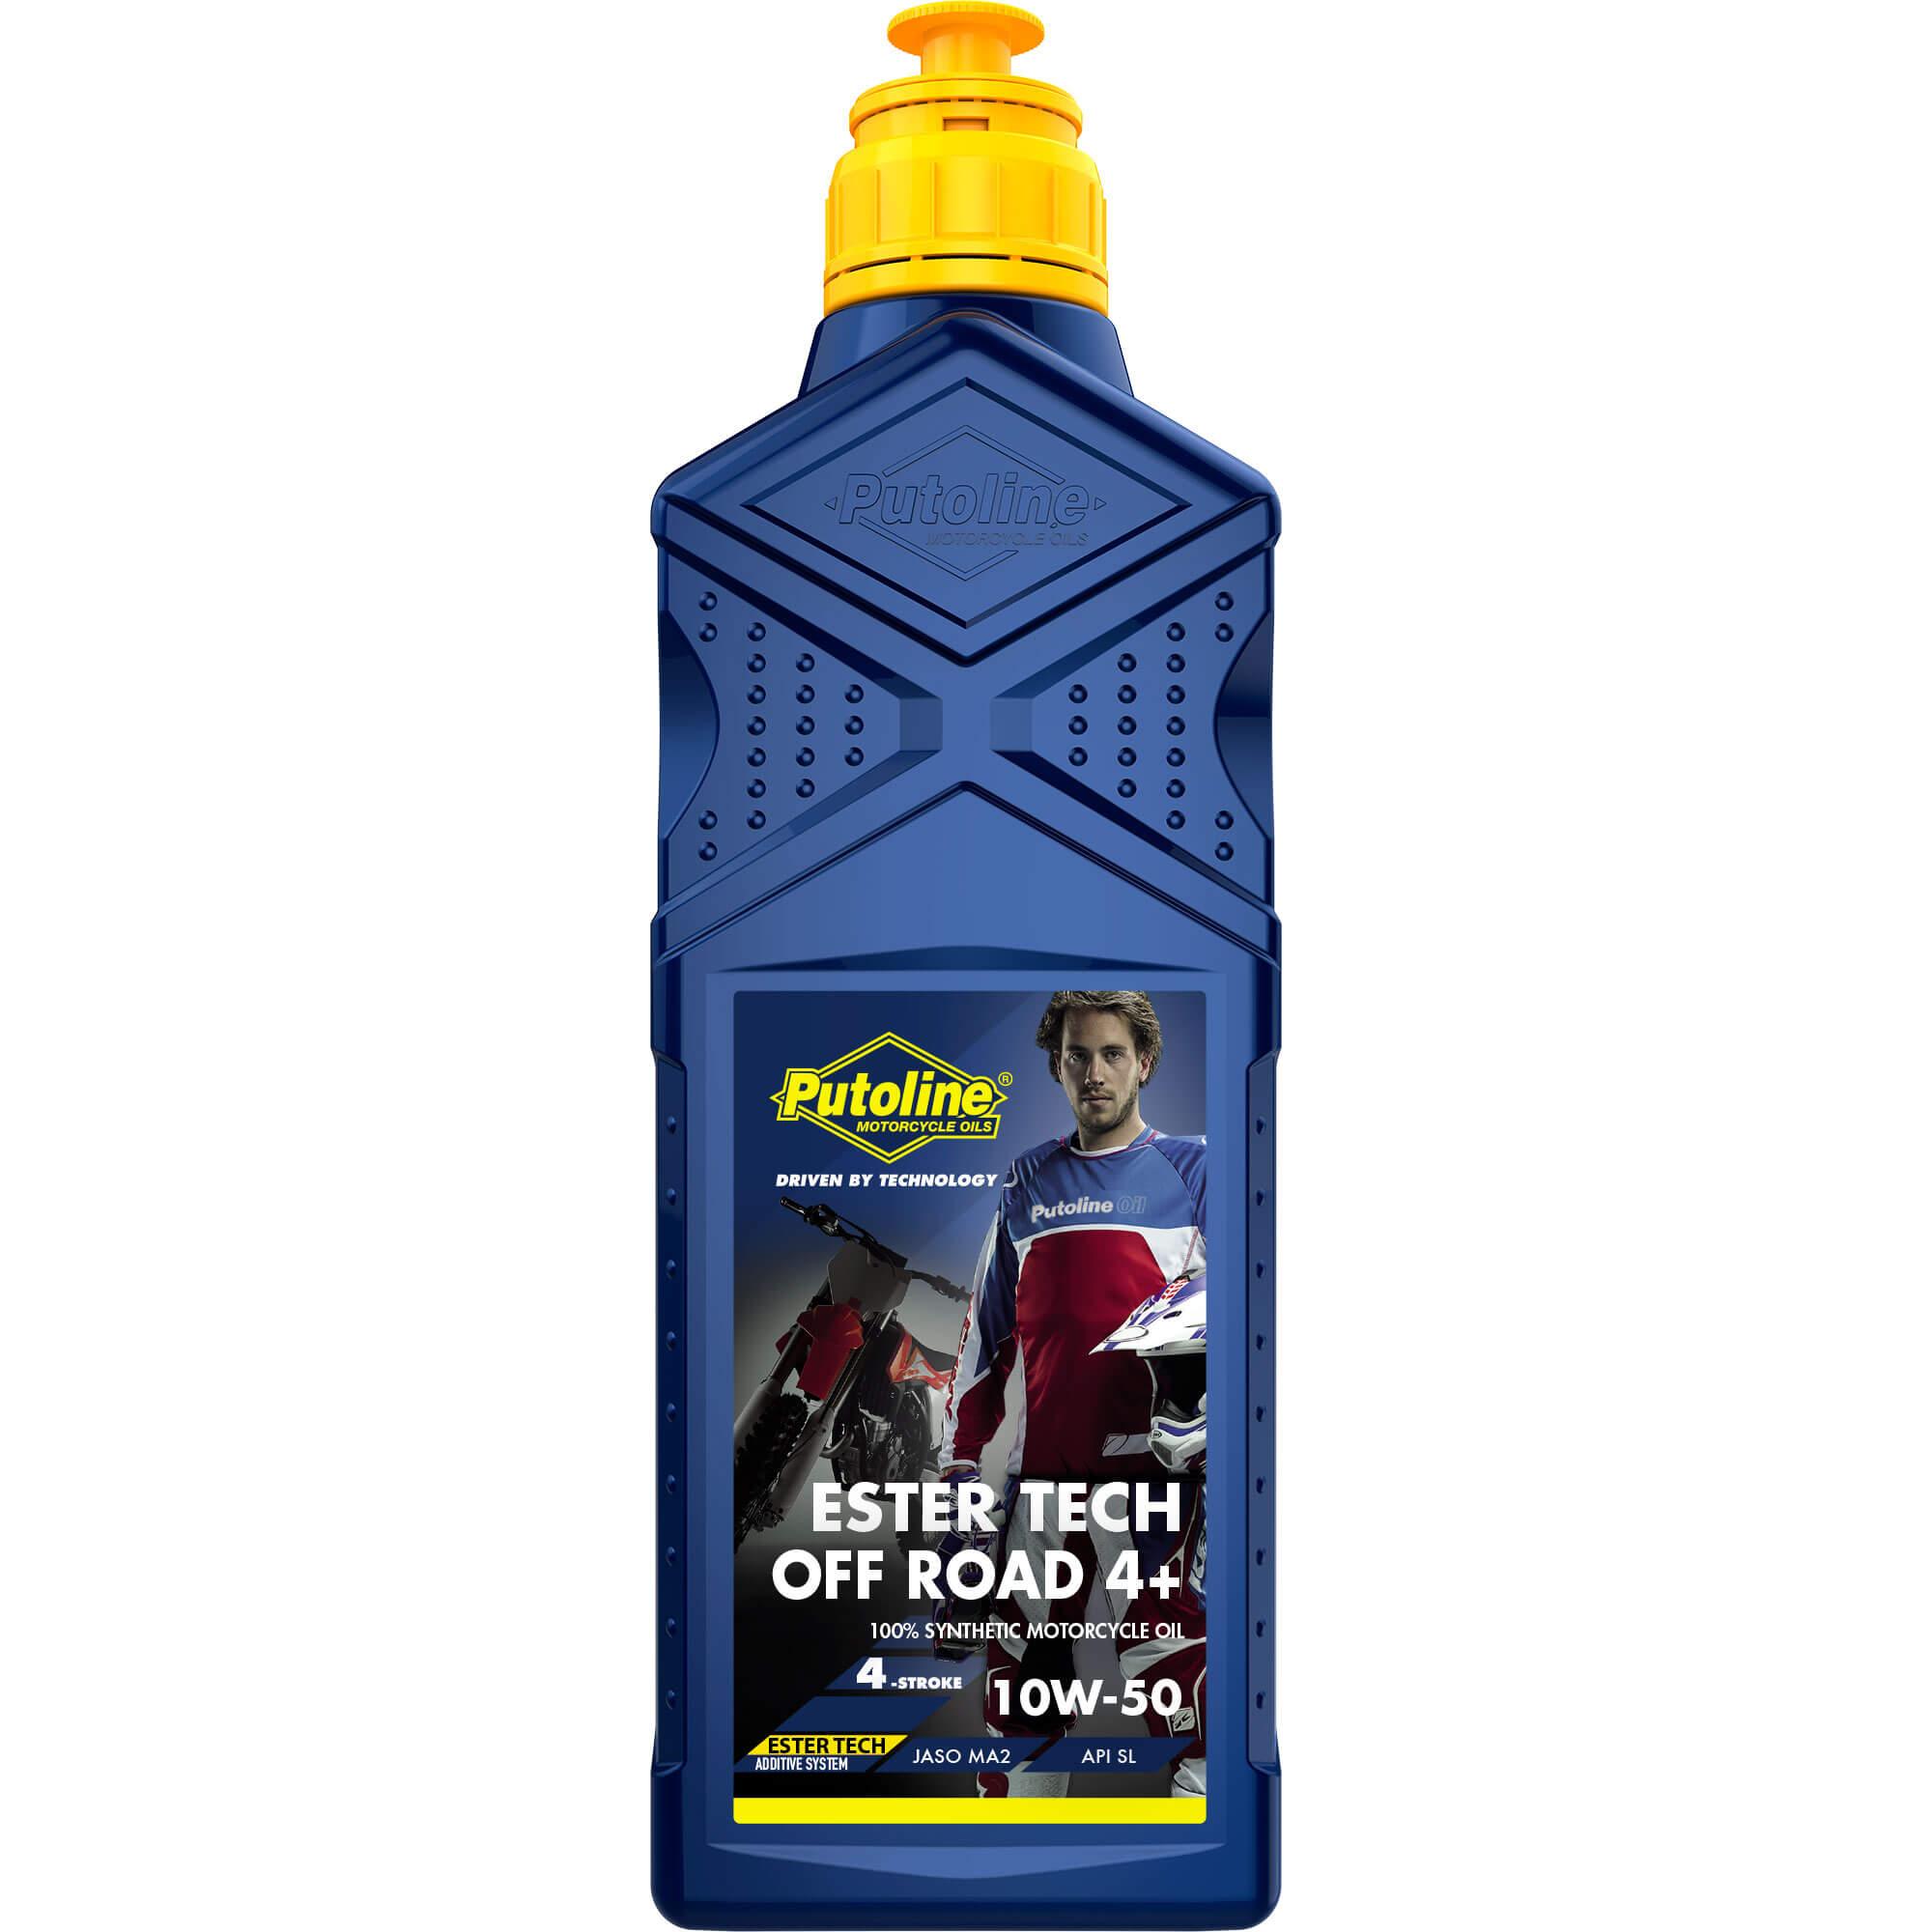 1L Putoline Ester Tech Off Road 4+ 10W50